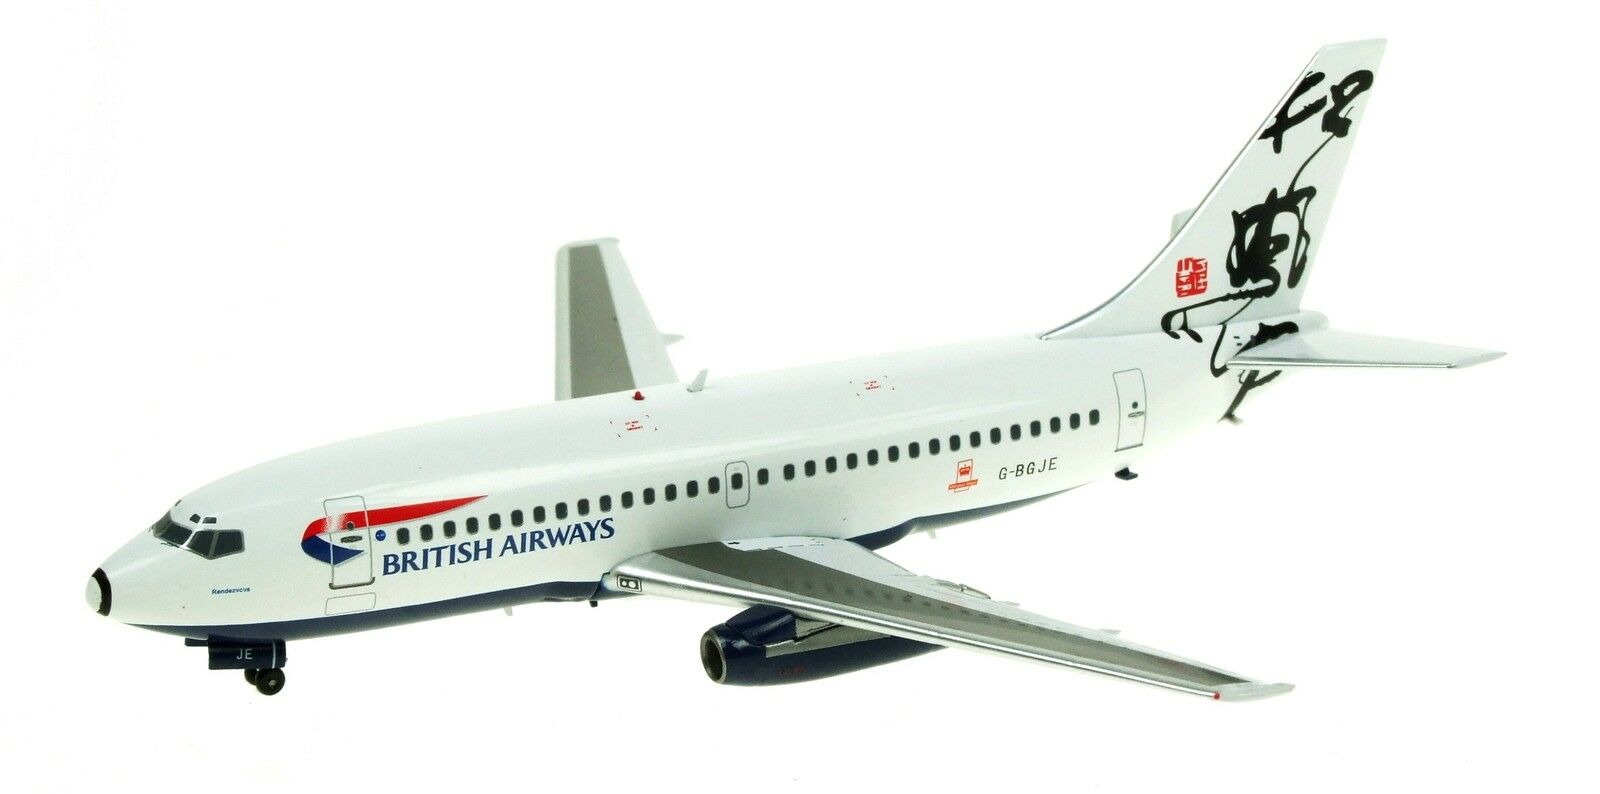 Inflight 200 If7321111c 1 200 Boeing 737-200 British Airways G-Bgje Rendezvous